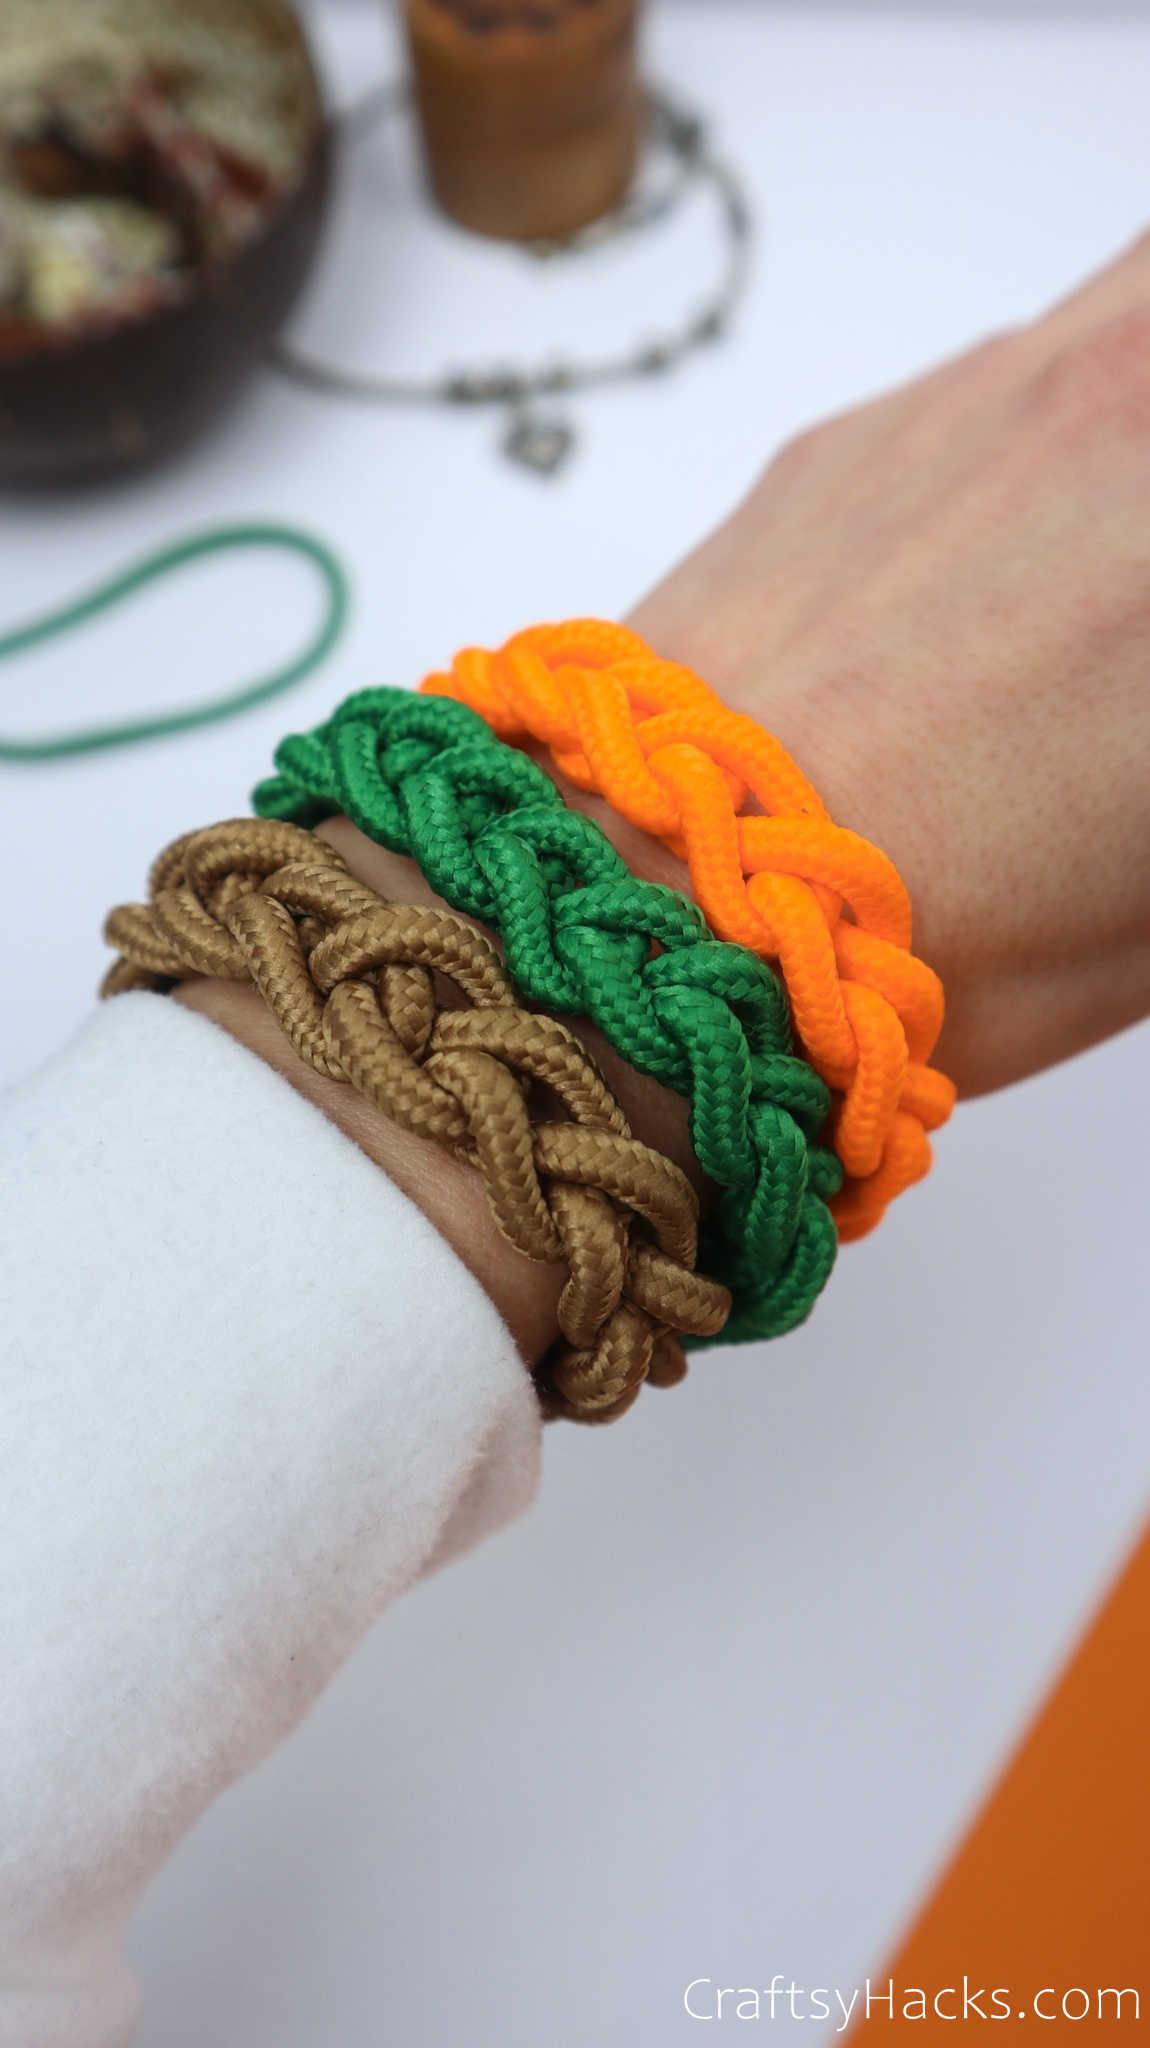 completed bracelets on wrist